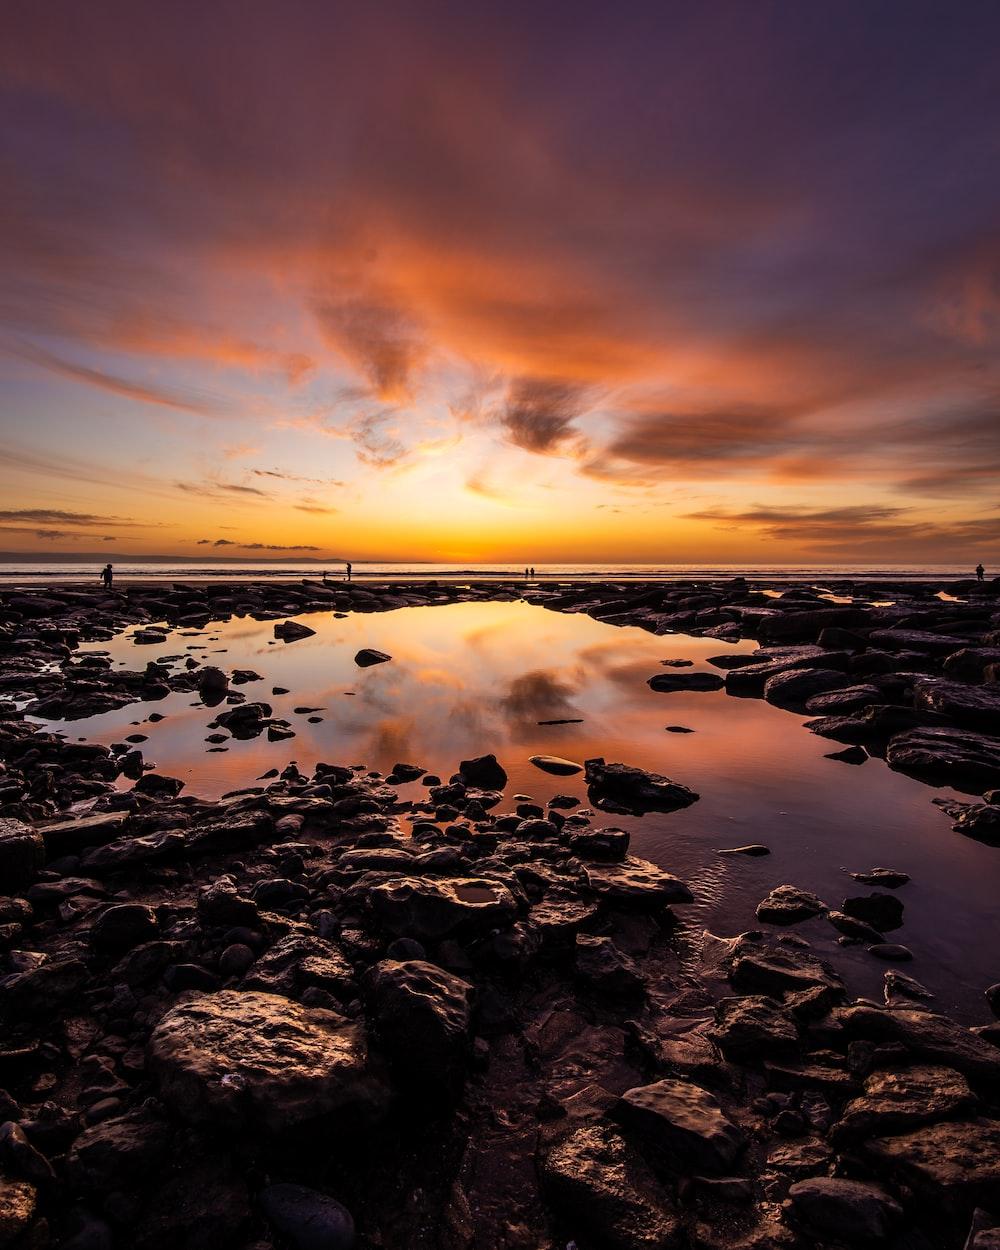 rocky shore under orange sunset